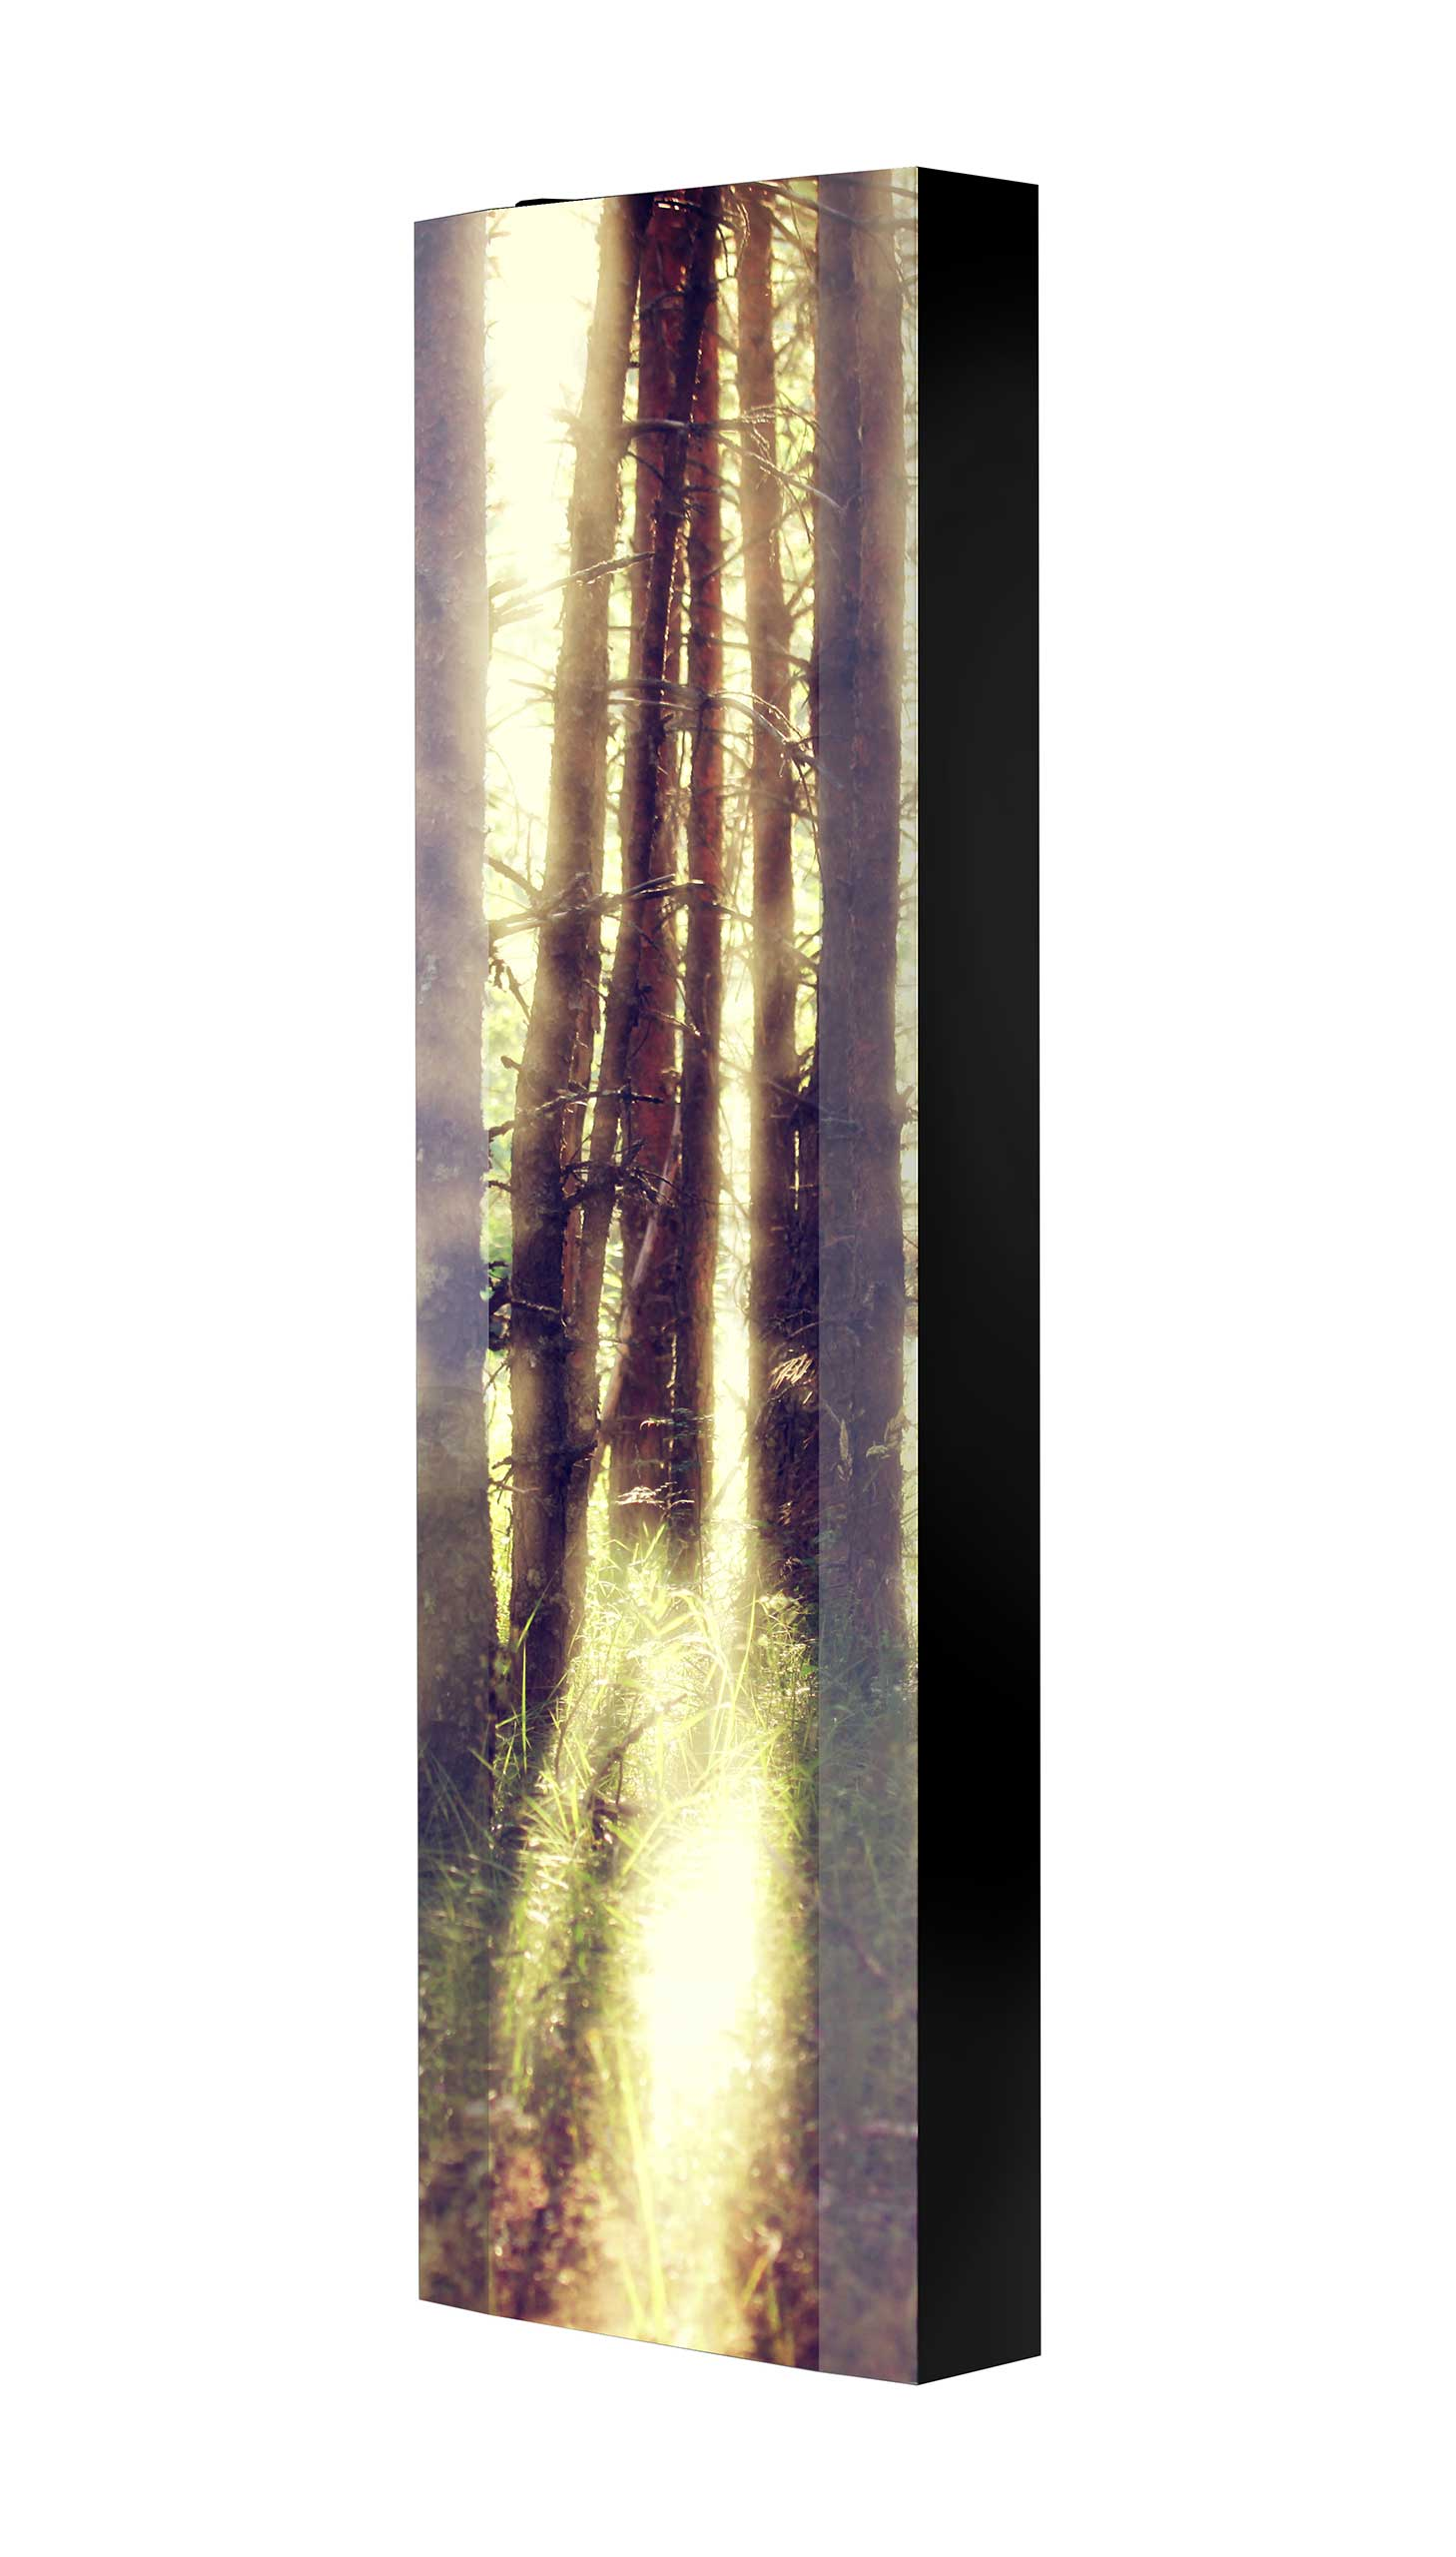 Schuhschrank FLASH 450 BLACK-EDITION Motivschrank schwarz drehbar M16 Wald Bäume